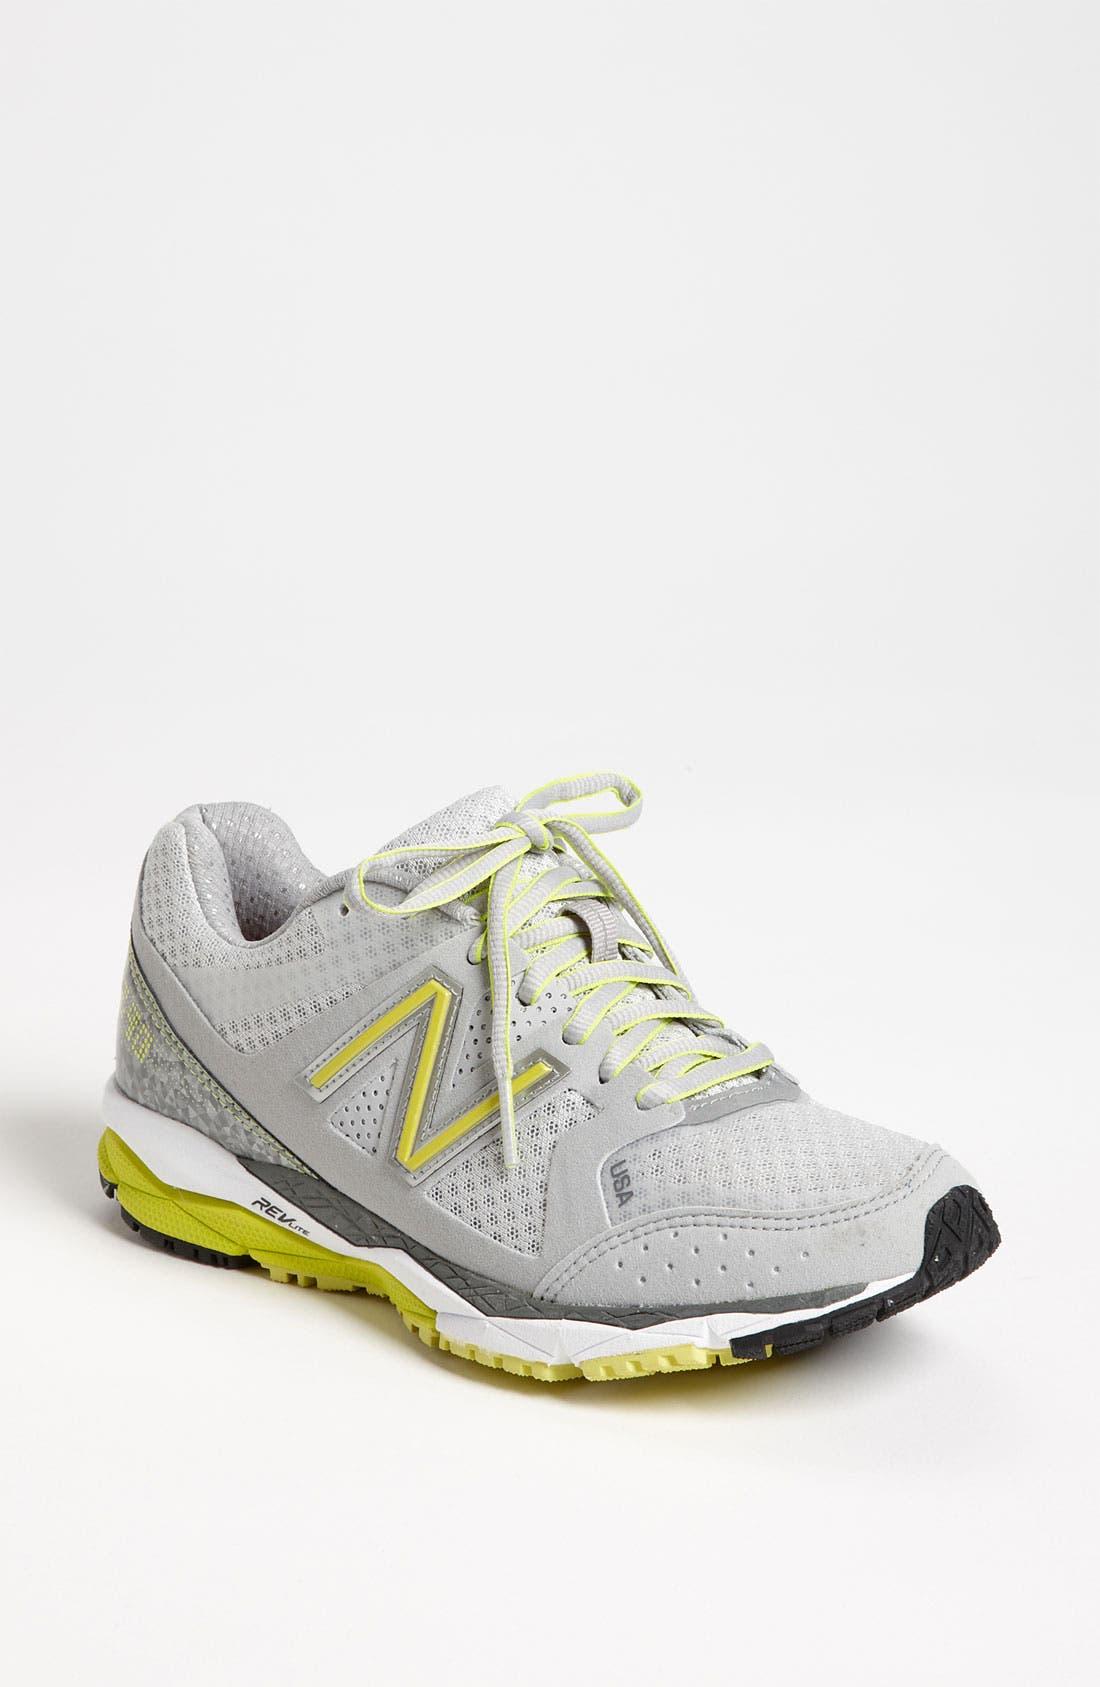 Alternate Image 1 Selected - New Balance '1290' Running Shoe (Women)